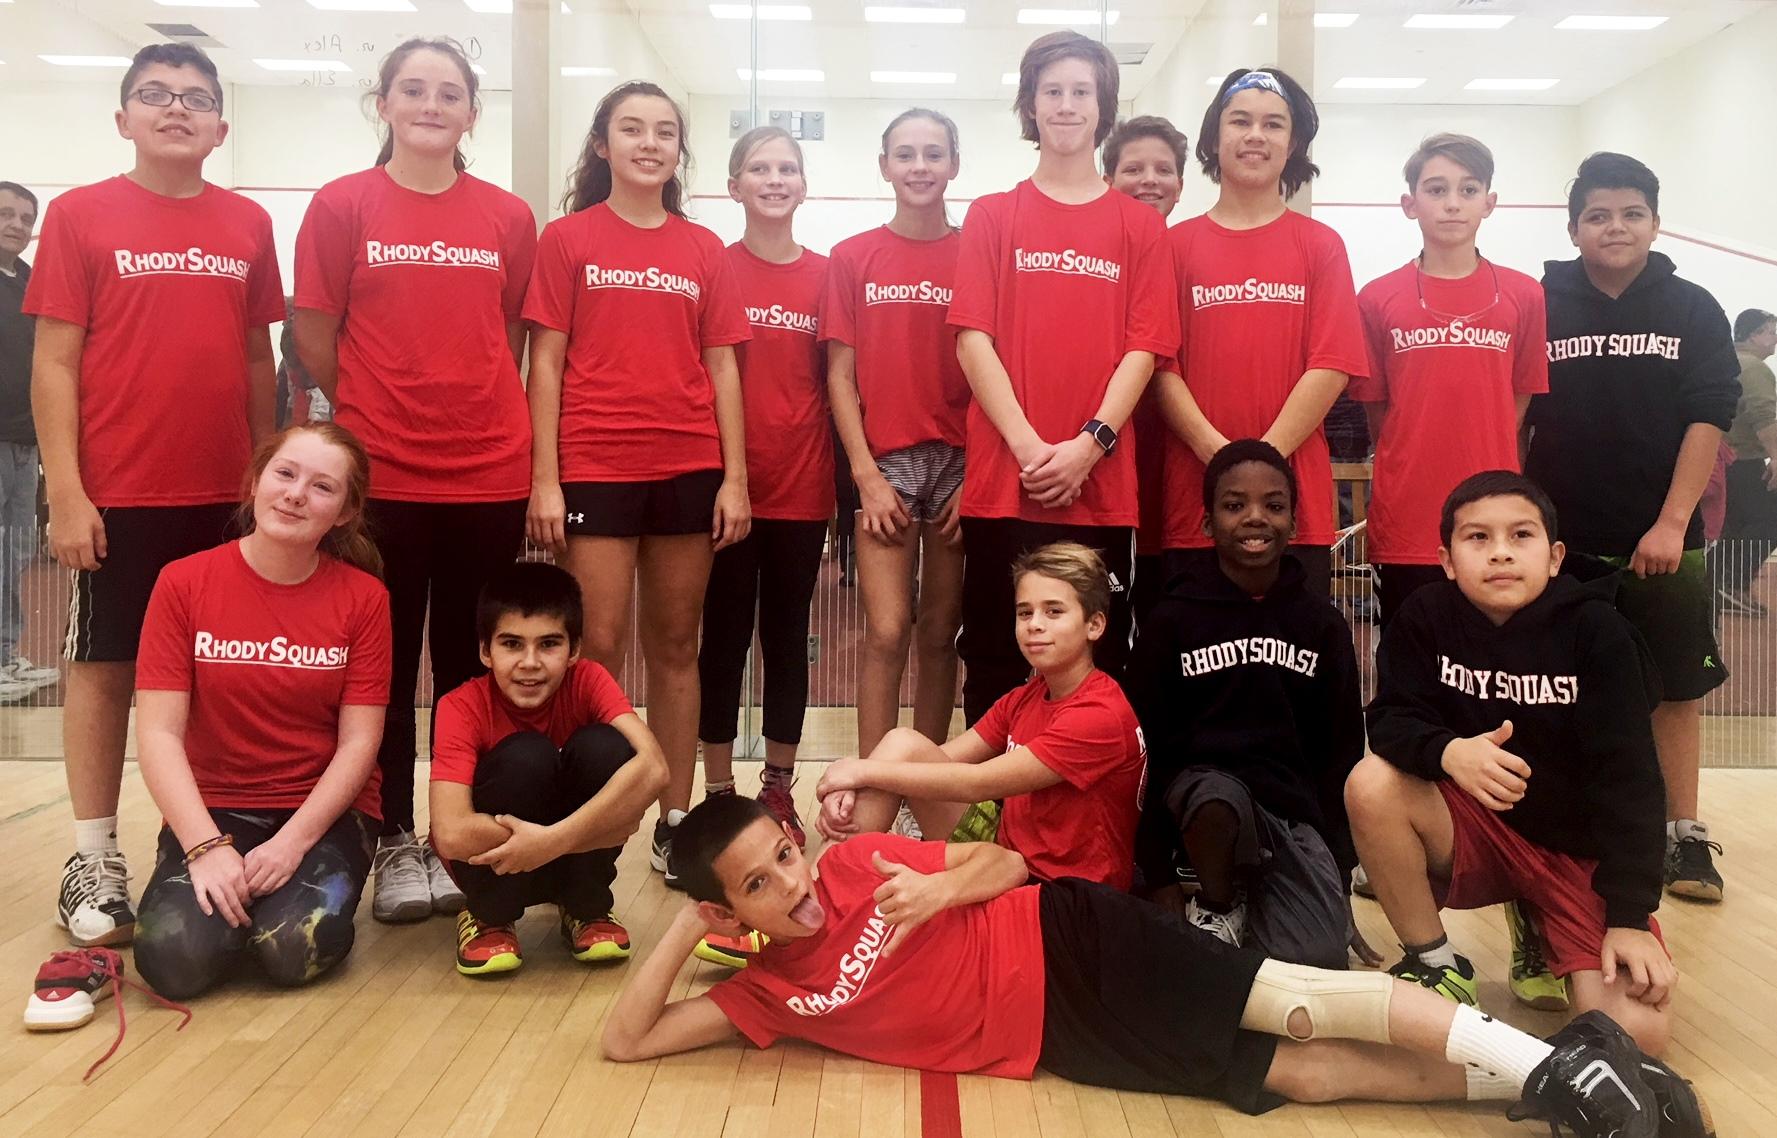 2018 rhodysquash team.JPG